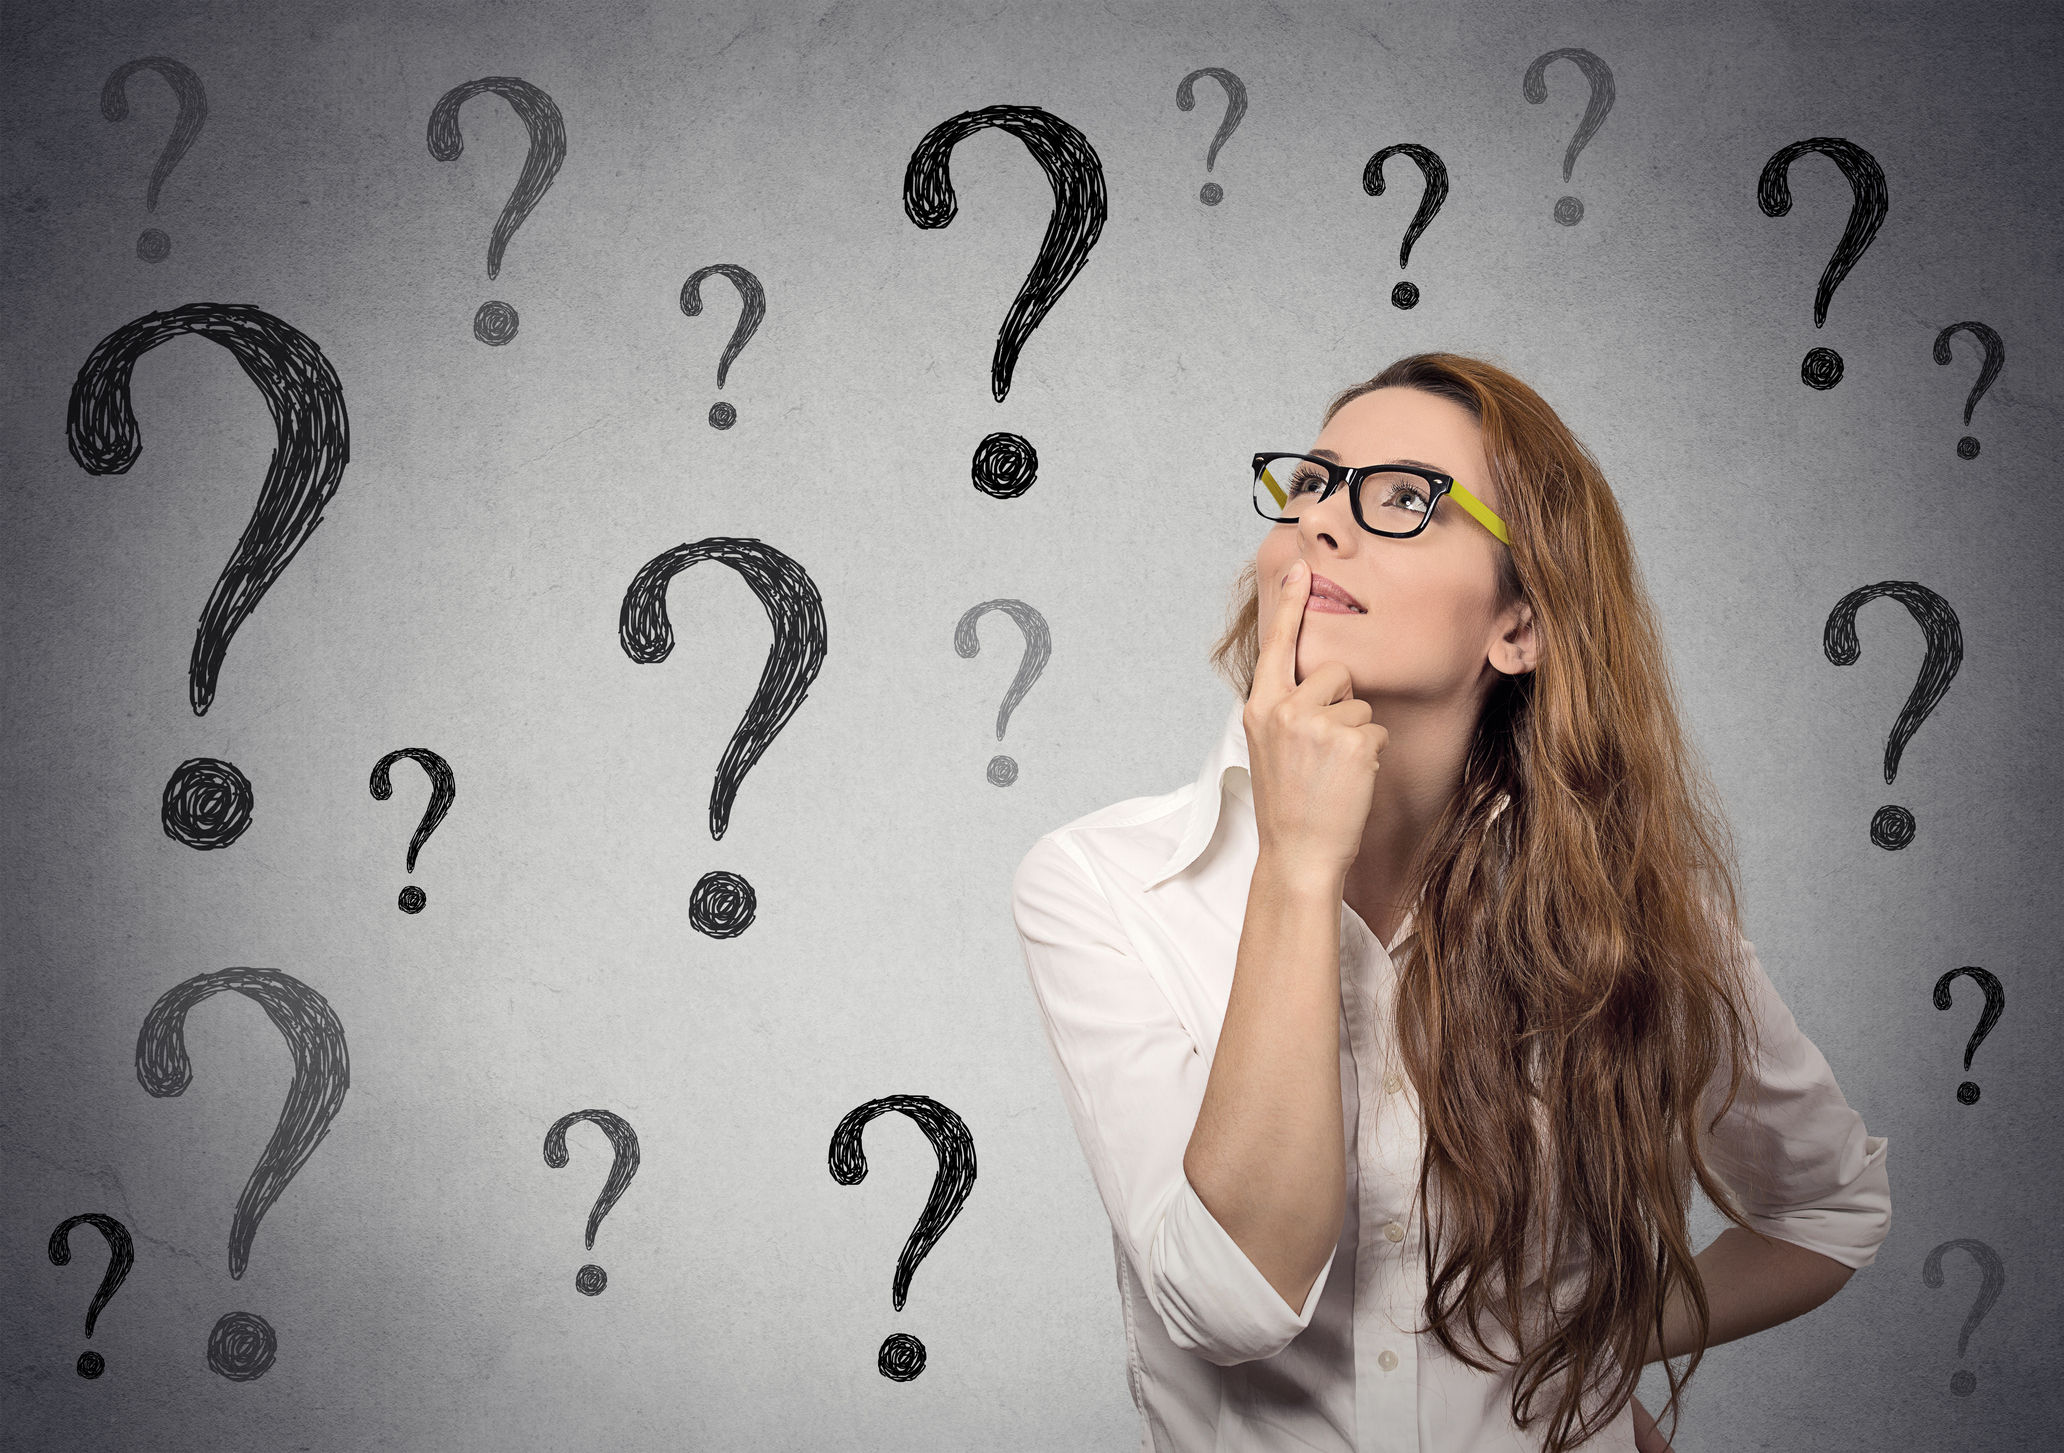 WiMAX口座振替が開通するまでにかかる日数は?